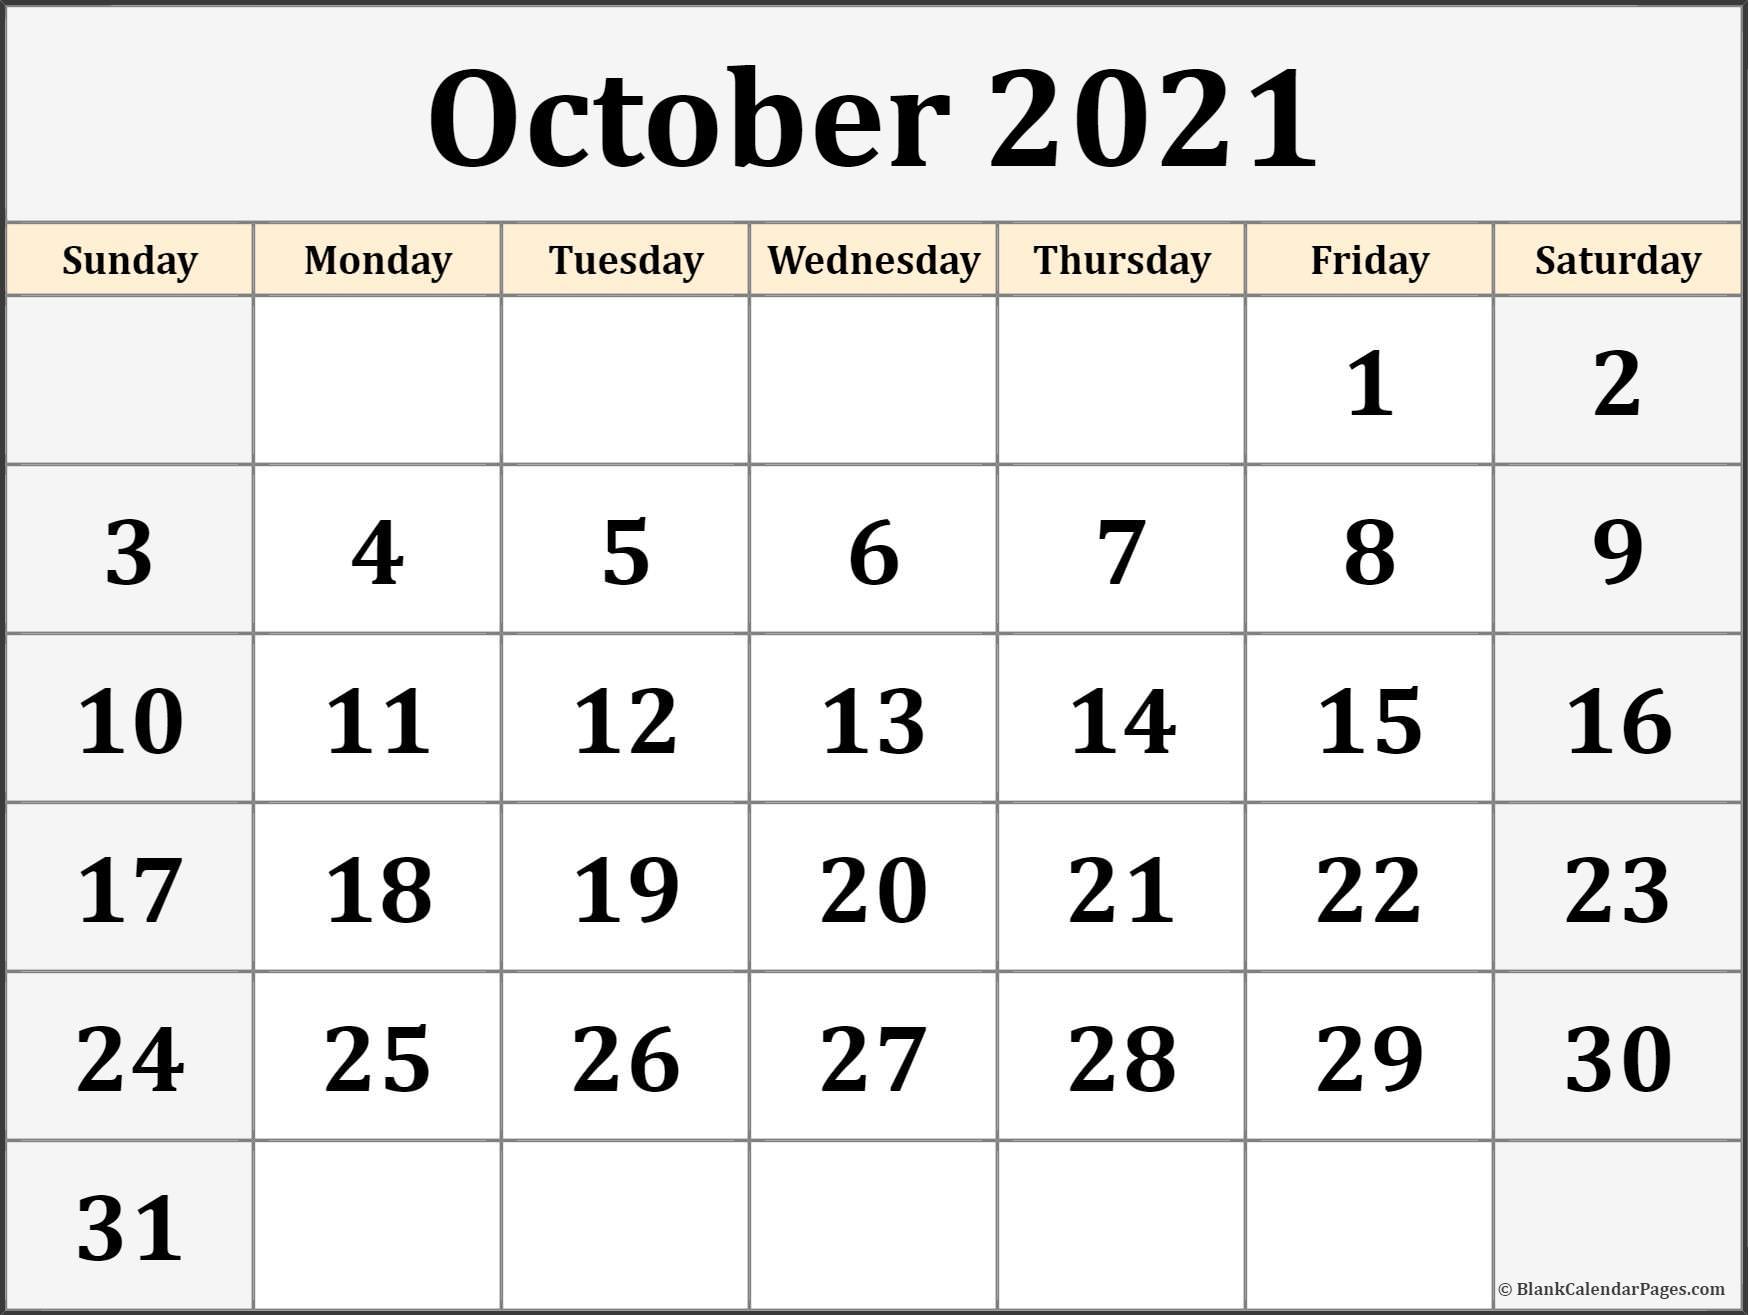 October 2021 Calendar Free Printable Monthly Calendars 1